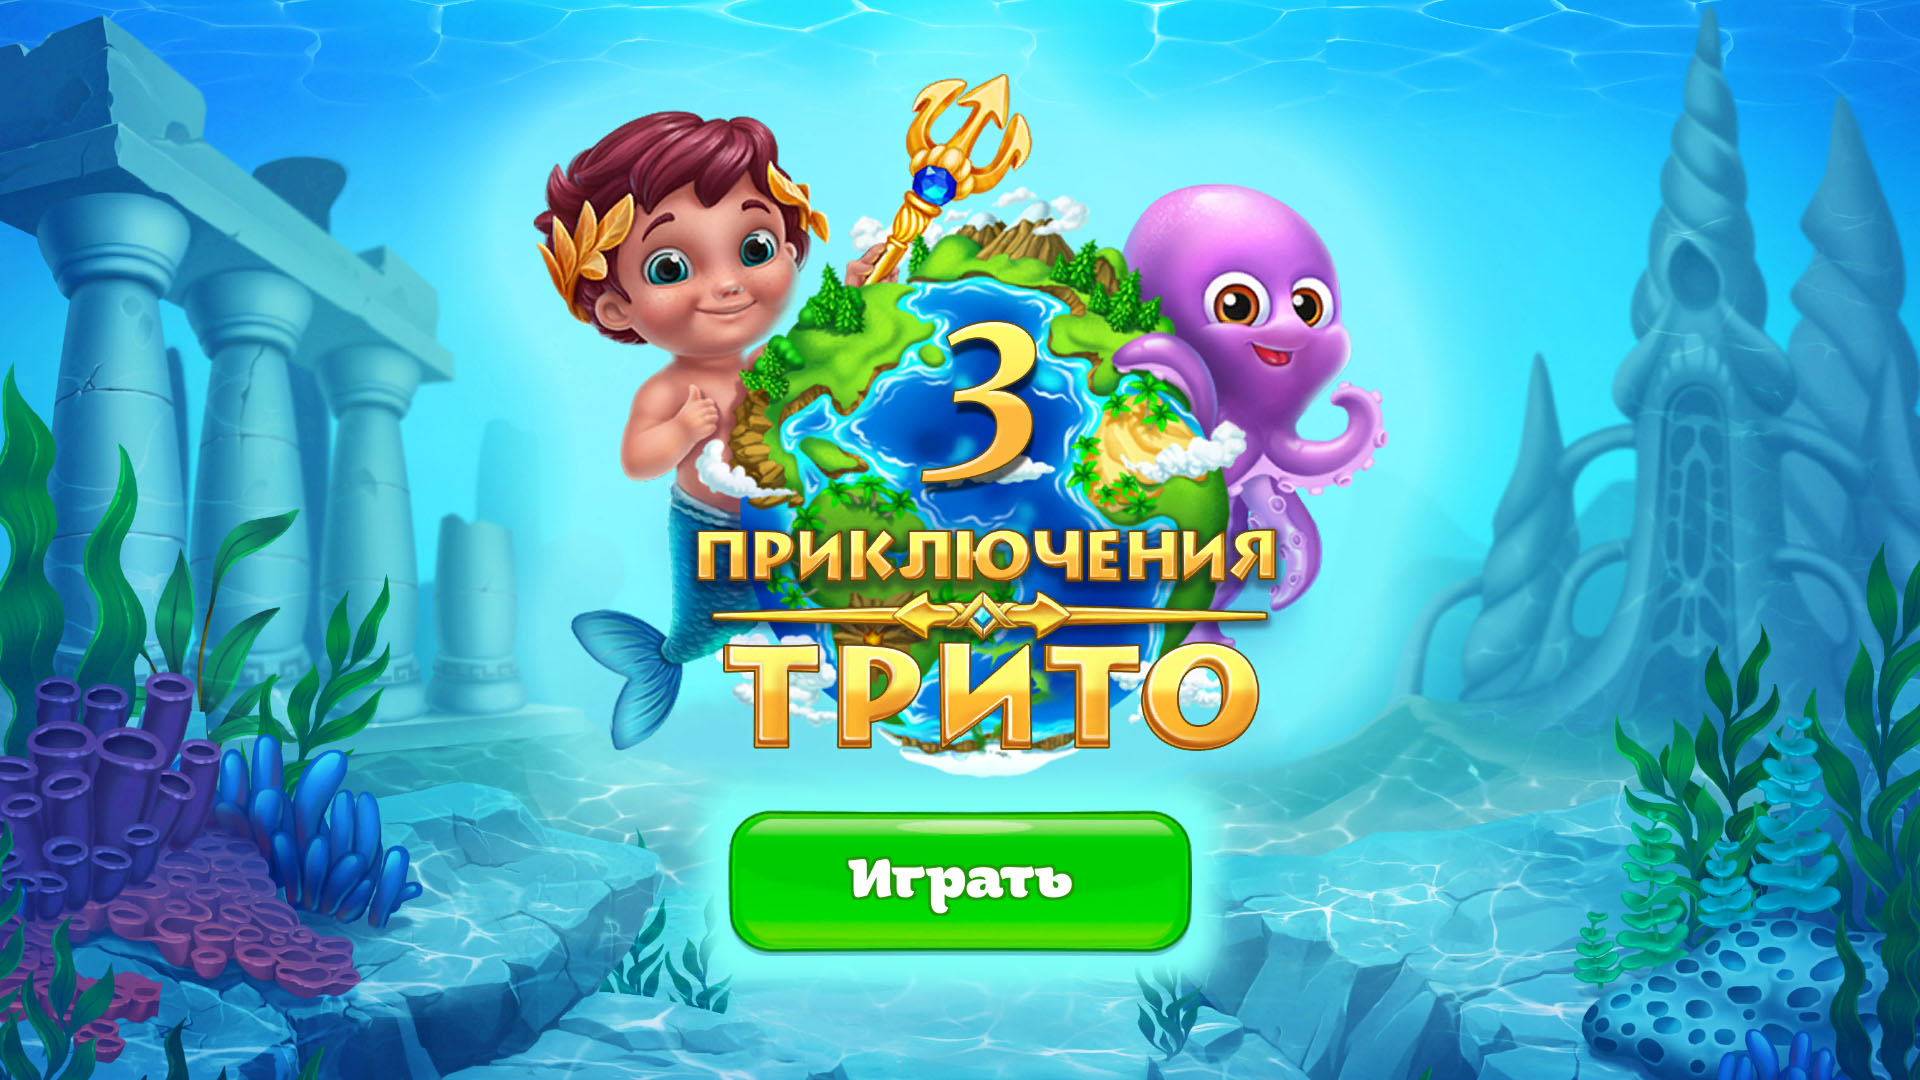 Приключения Трито 3 | Trito's Adventure 3 Multi (Rus)